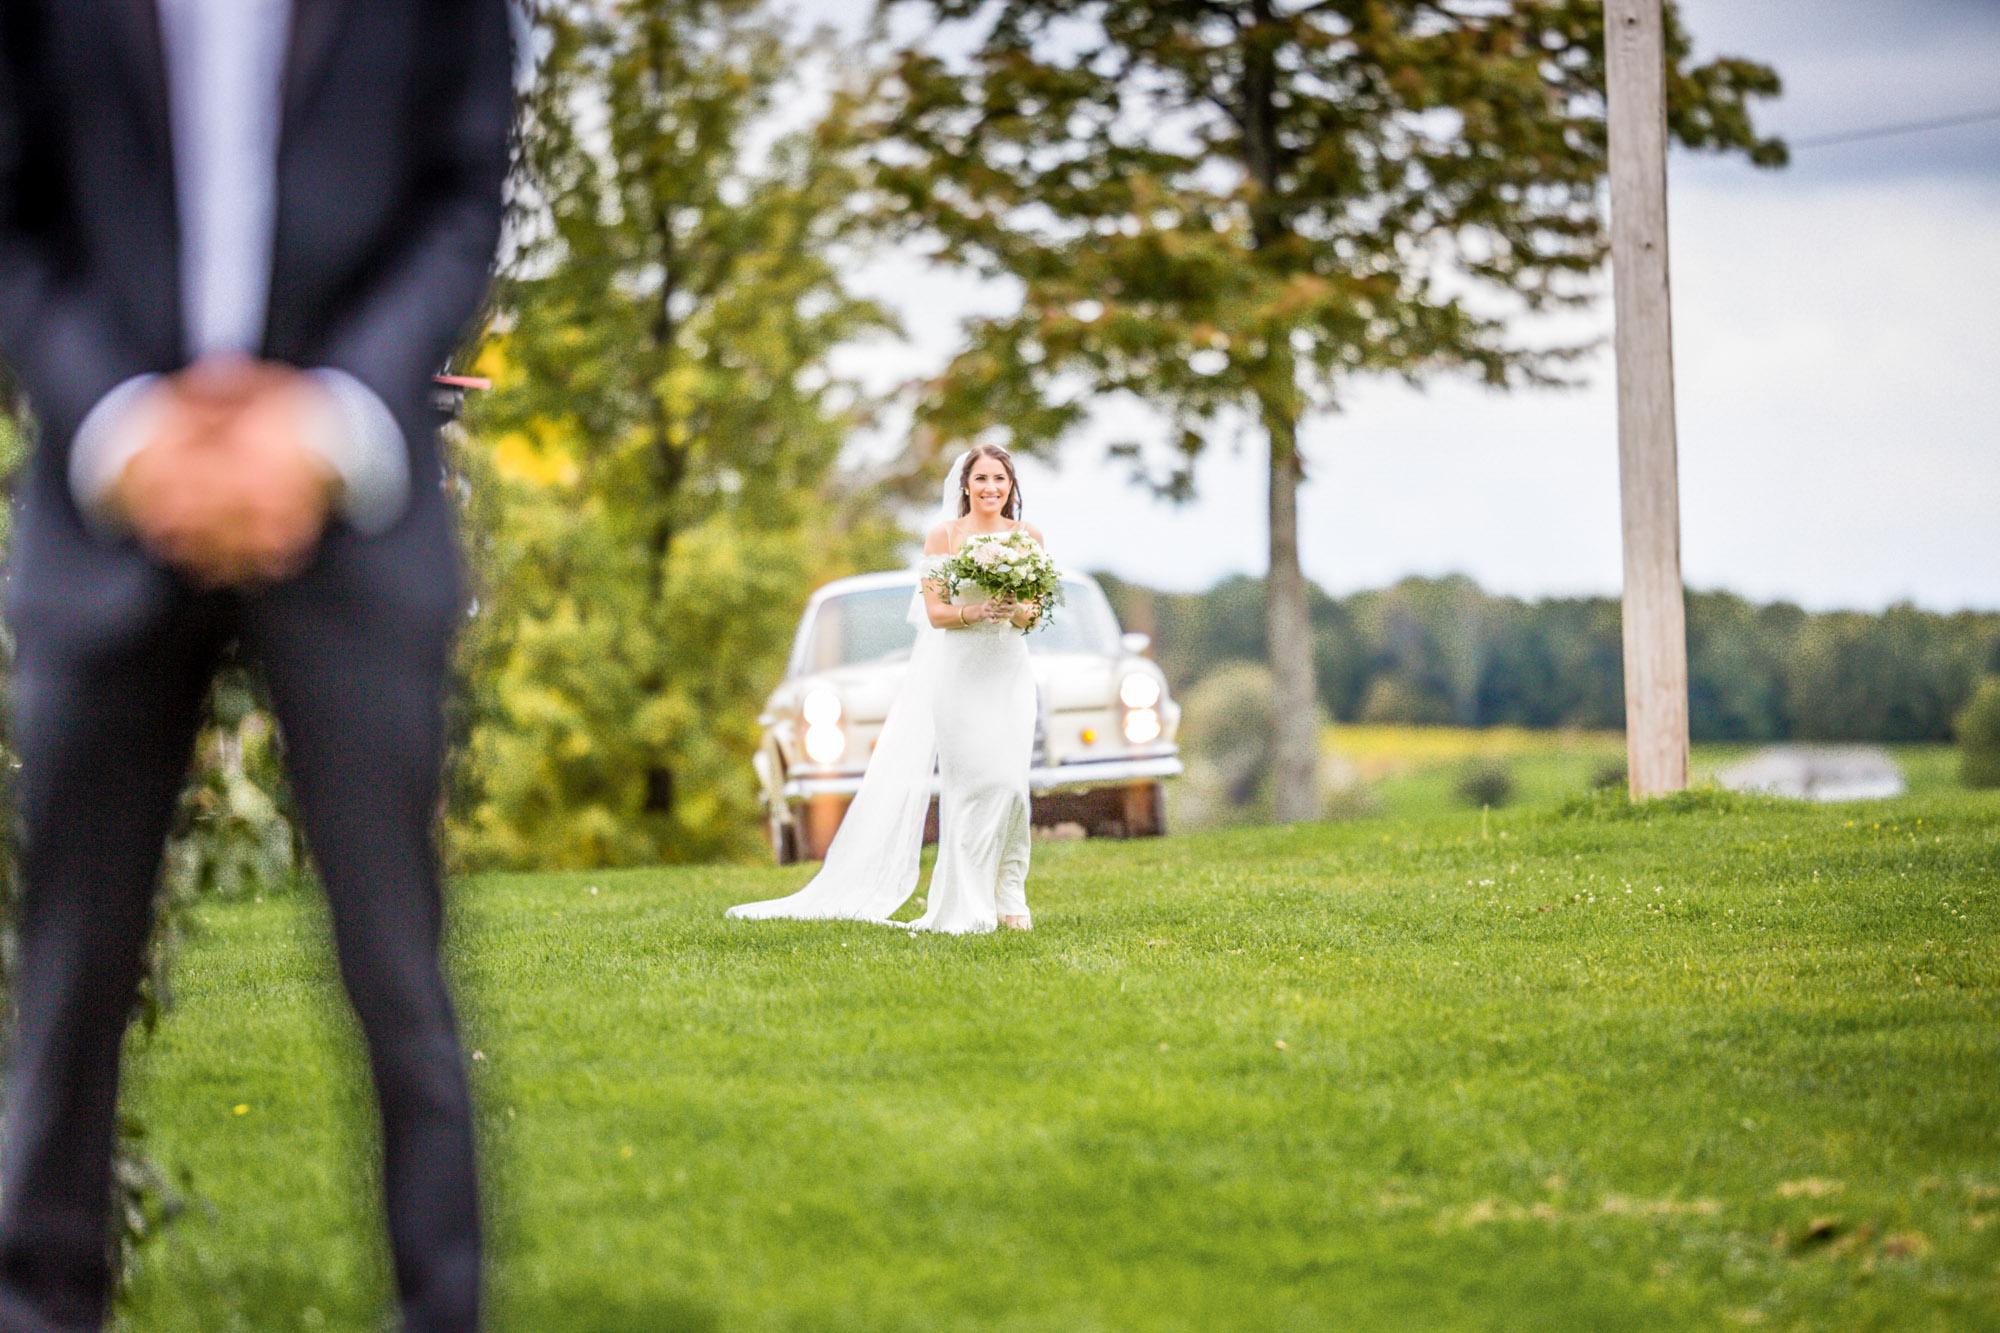 scranton_wedding_photographer_lettieri_pa (12 of 34).jpg